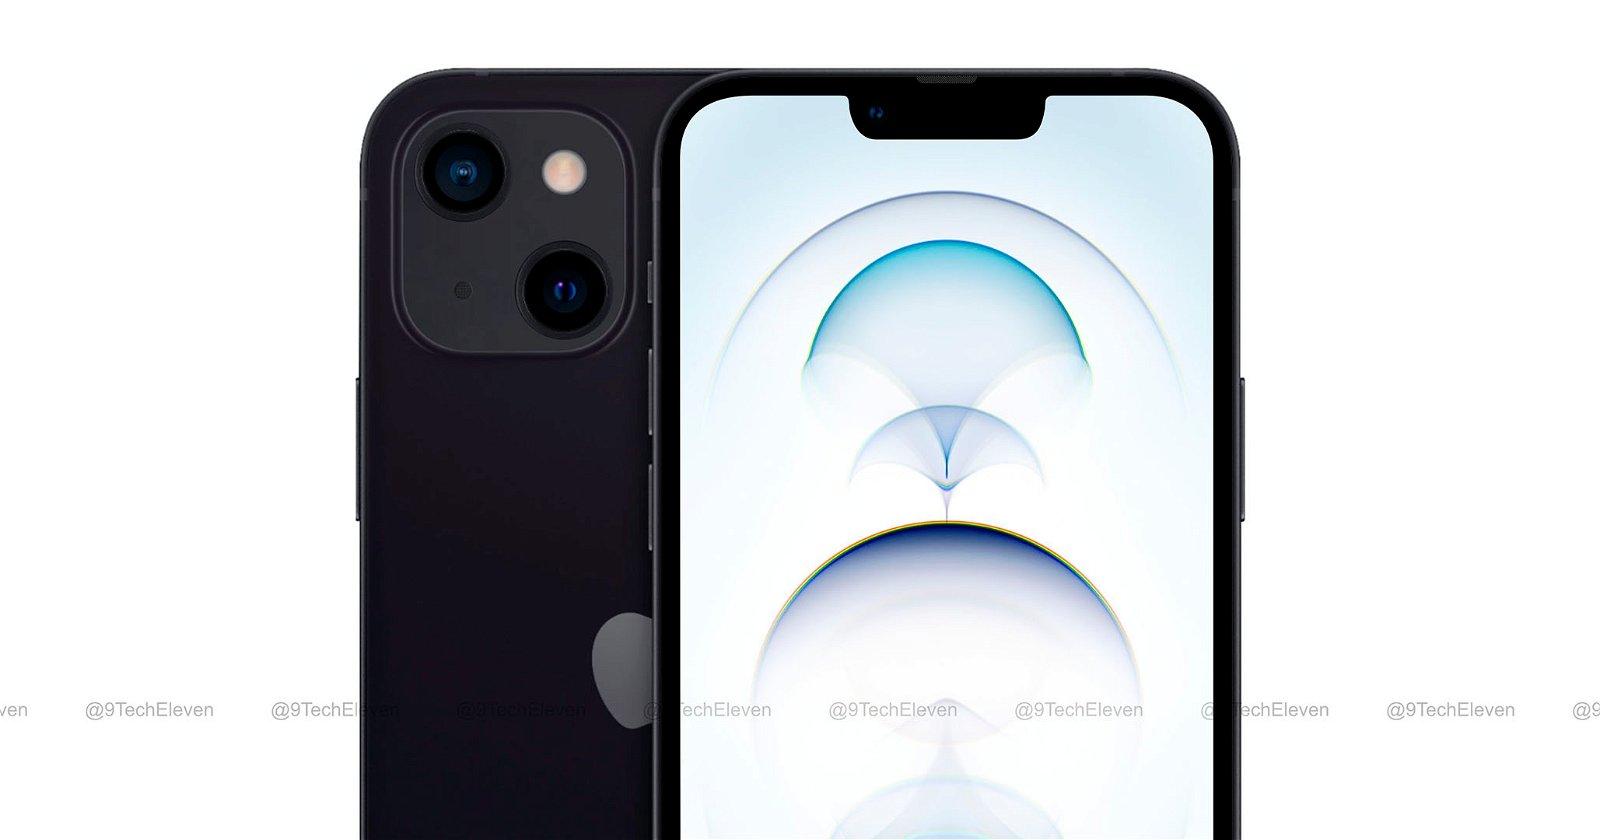 concepto iPhone 13 de 9techeleven